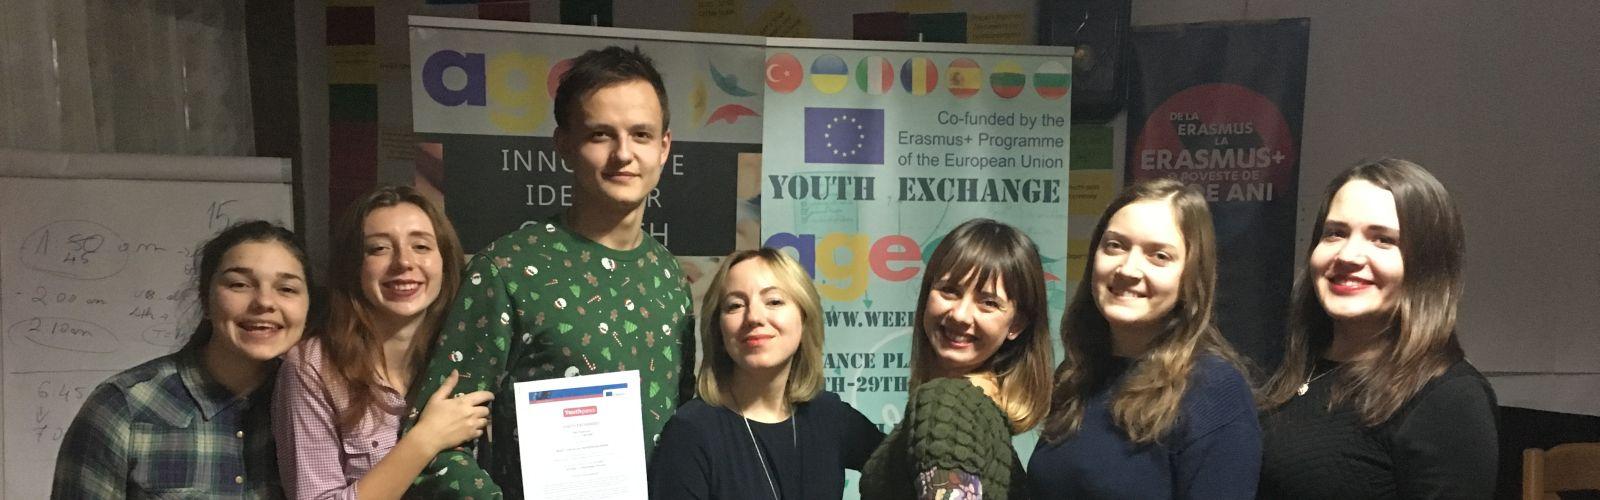 Молодіжний обмін з Erasmus + Countries на тему «Ready for social entrepreneurship» у Румунії